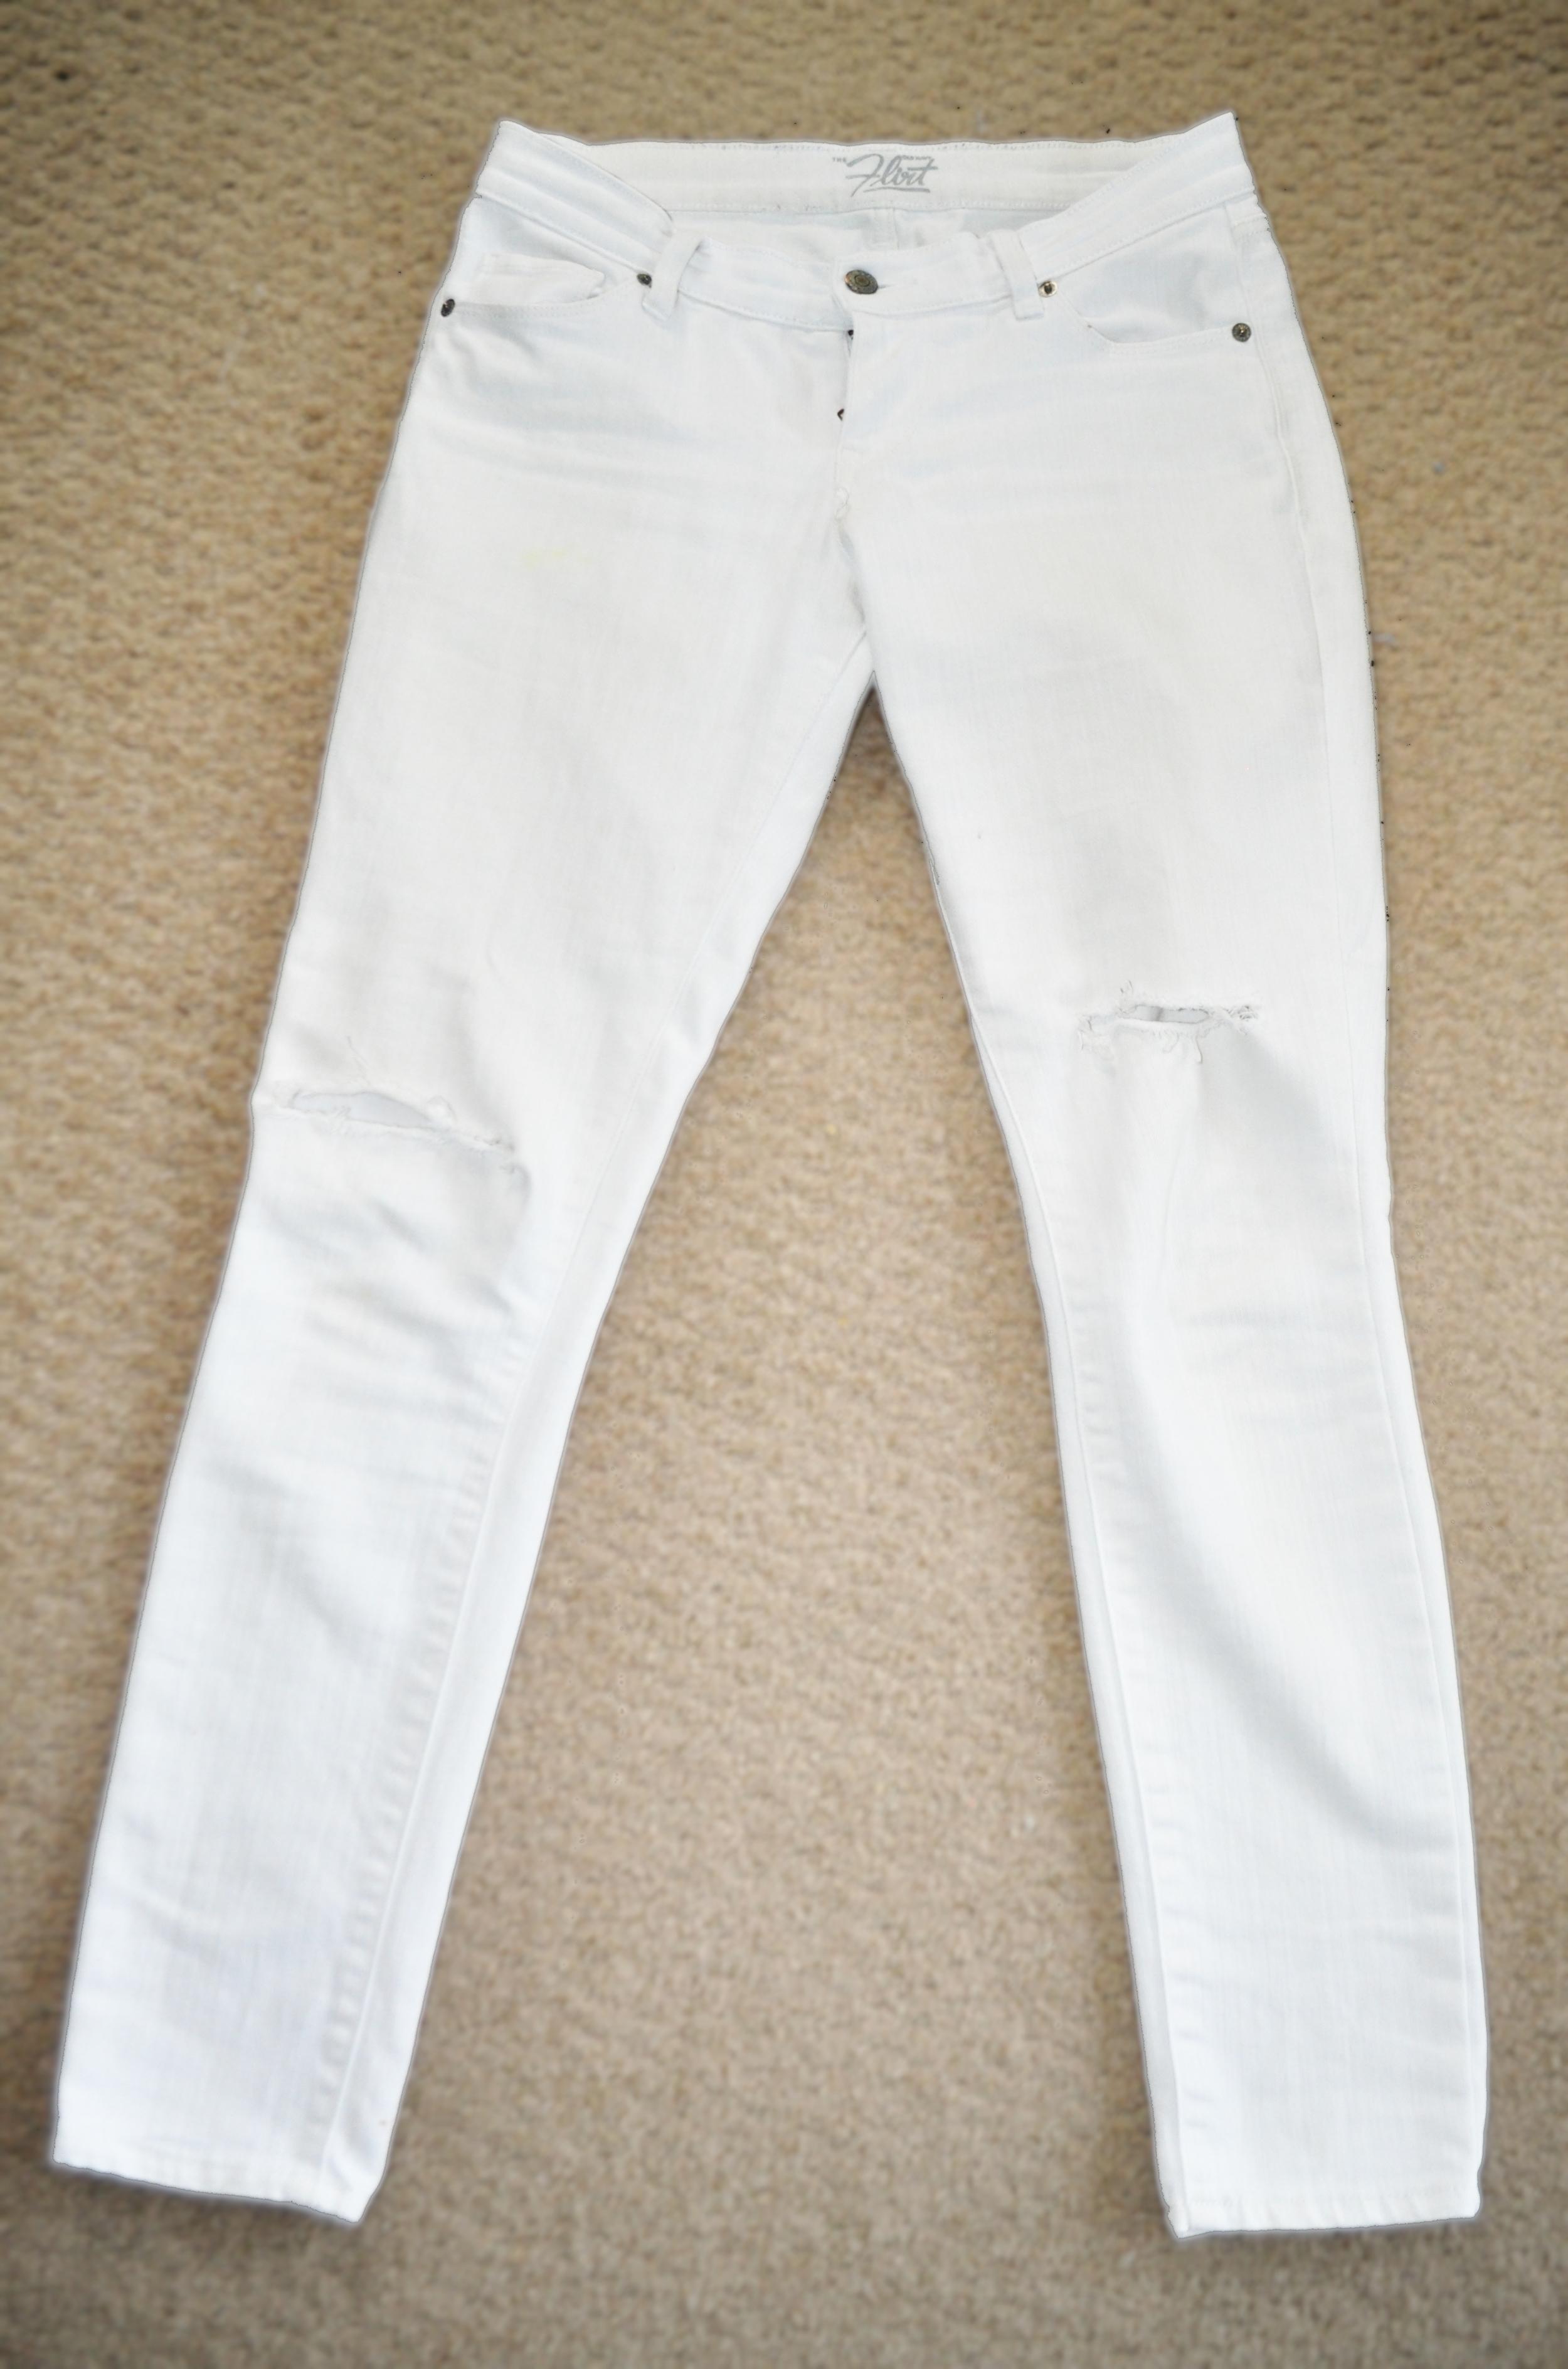 Jeans .jpg